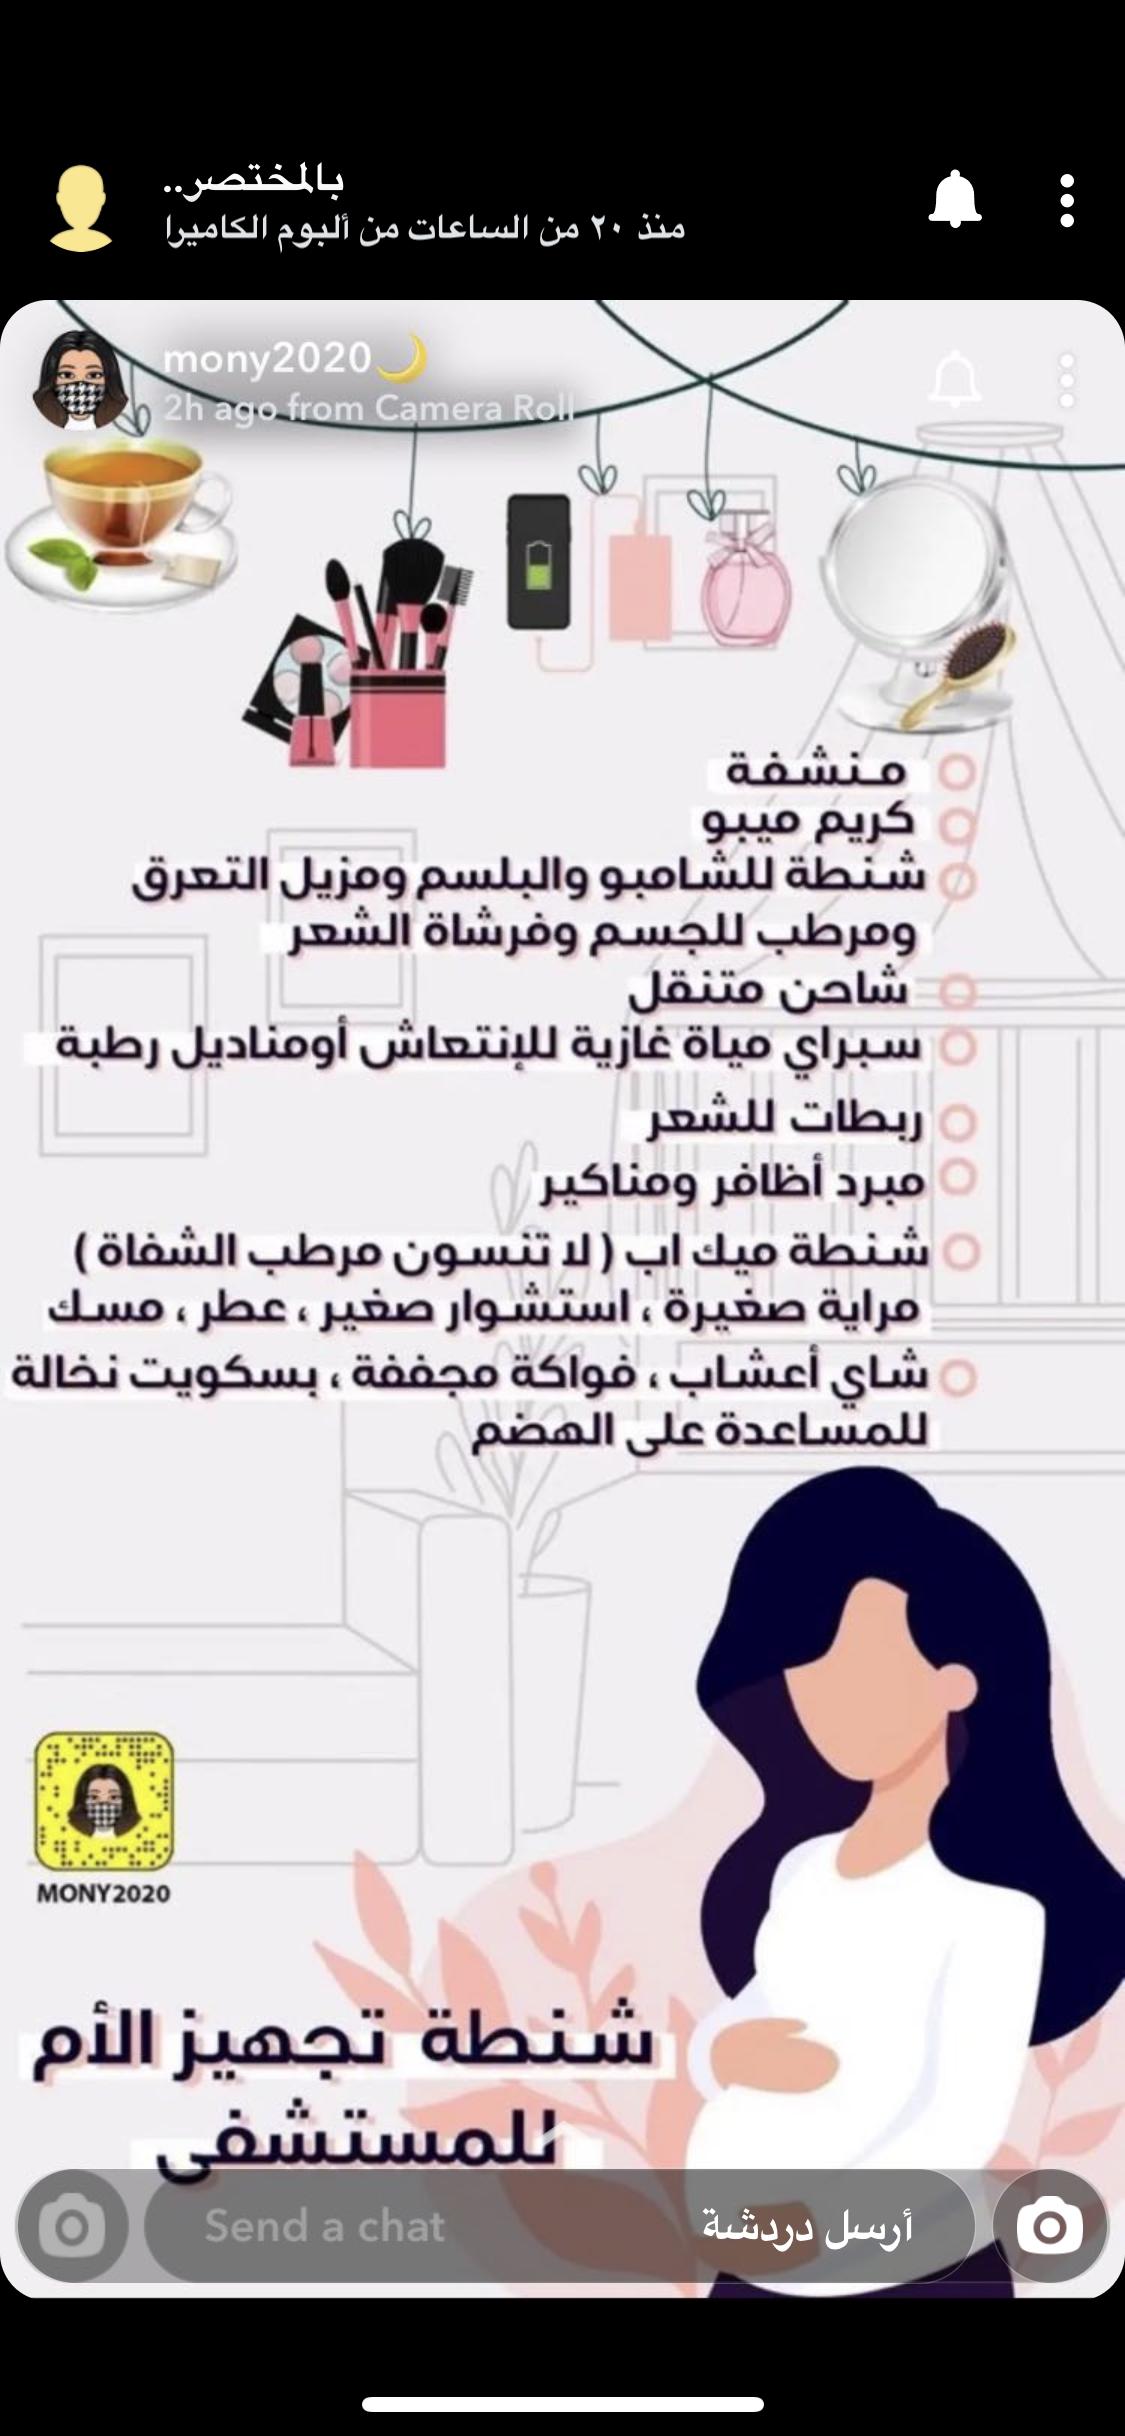 Pin By Amal Saeed On الشهر التاسع ويوم الولاده In 2020 Camera